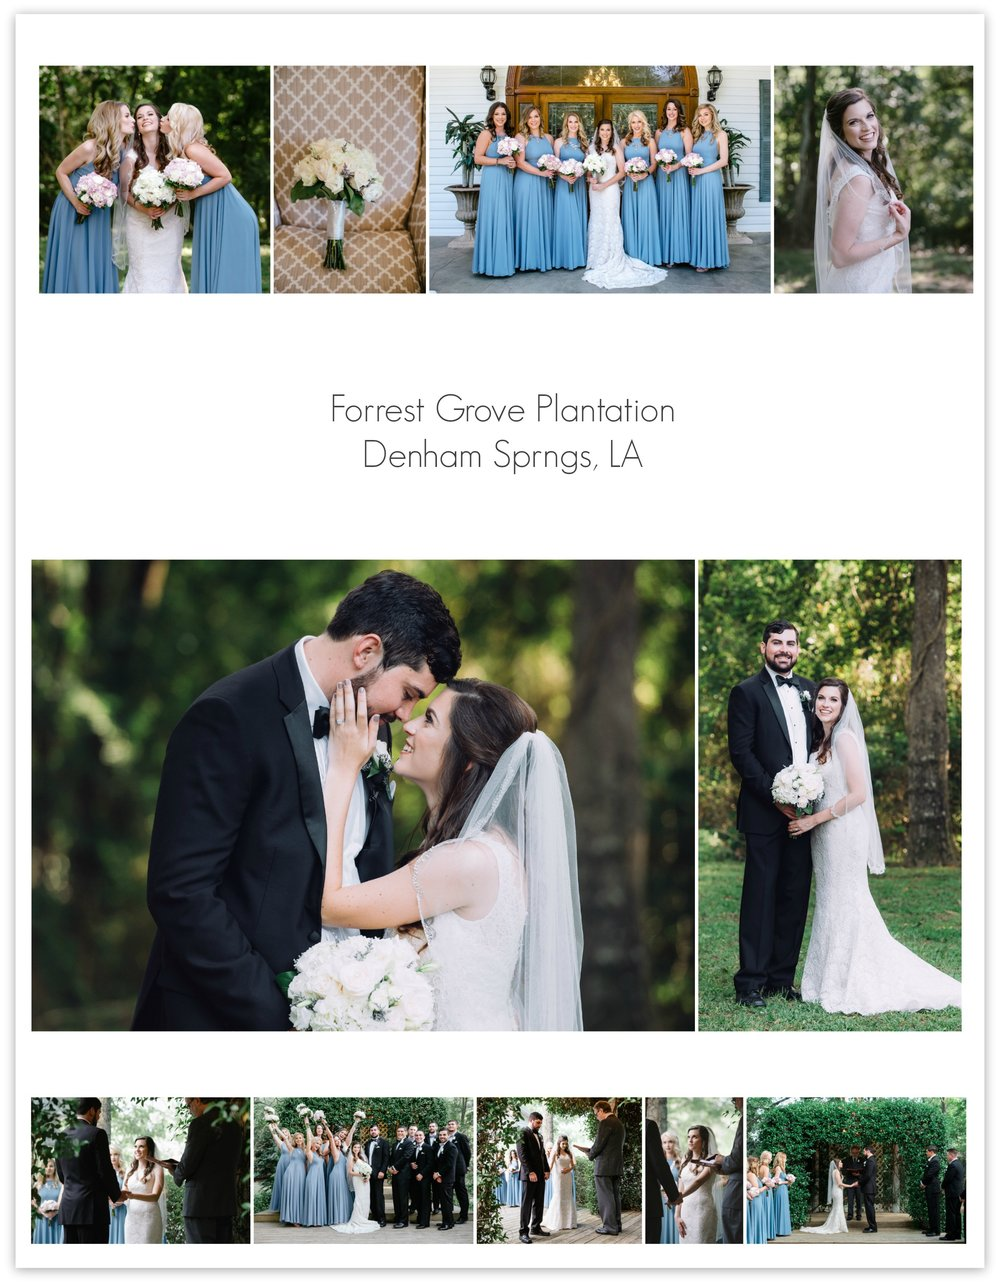 forrest-grove-plantation-denham-springs-wedding